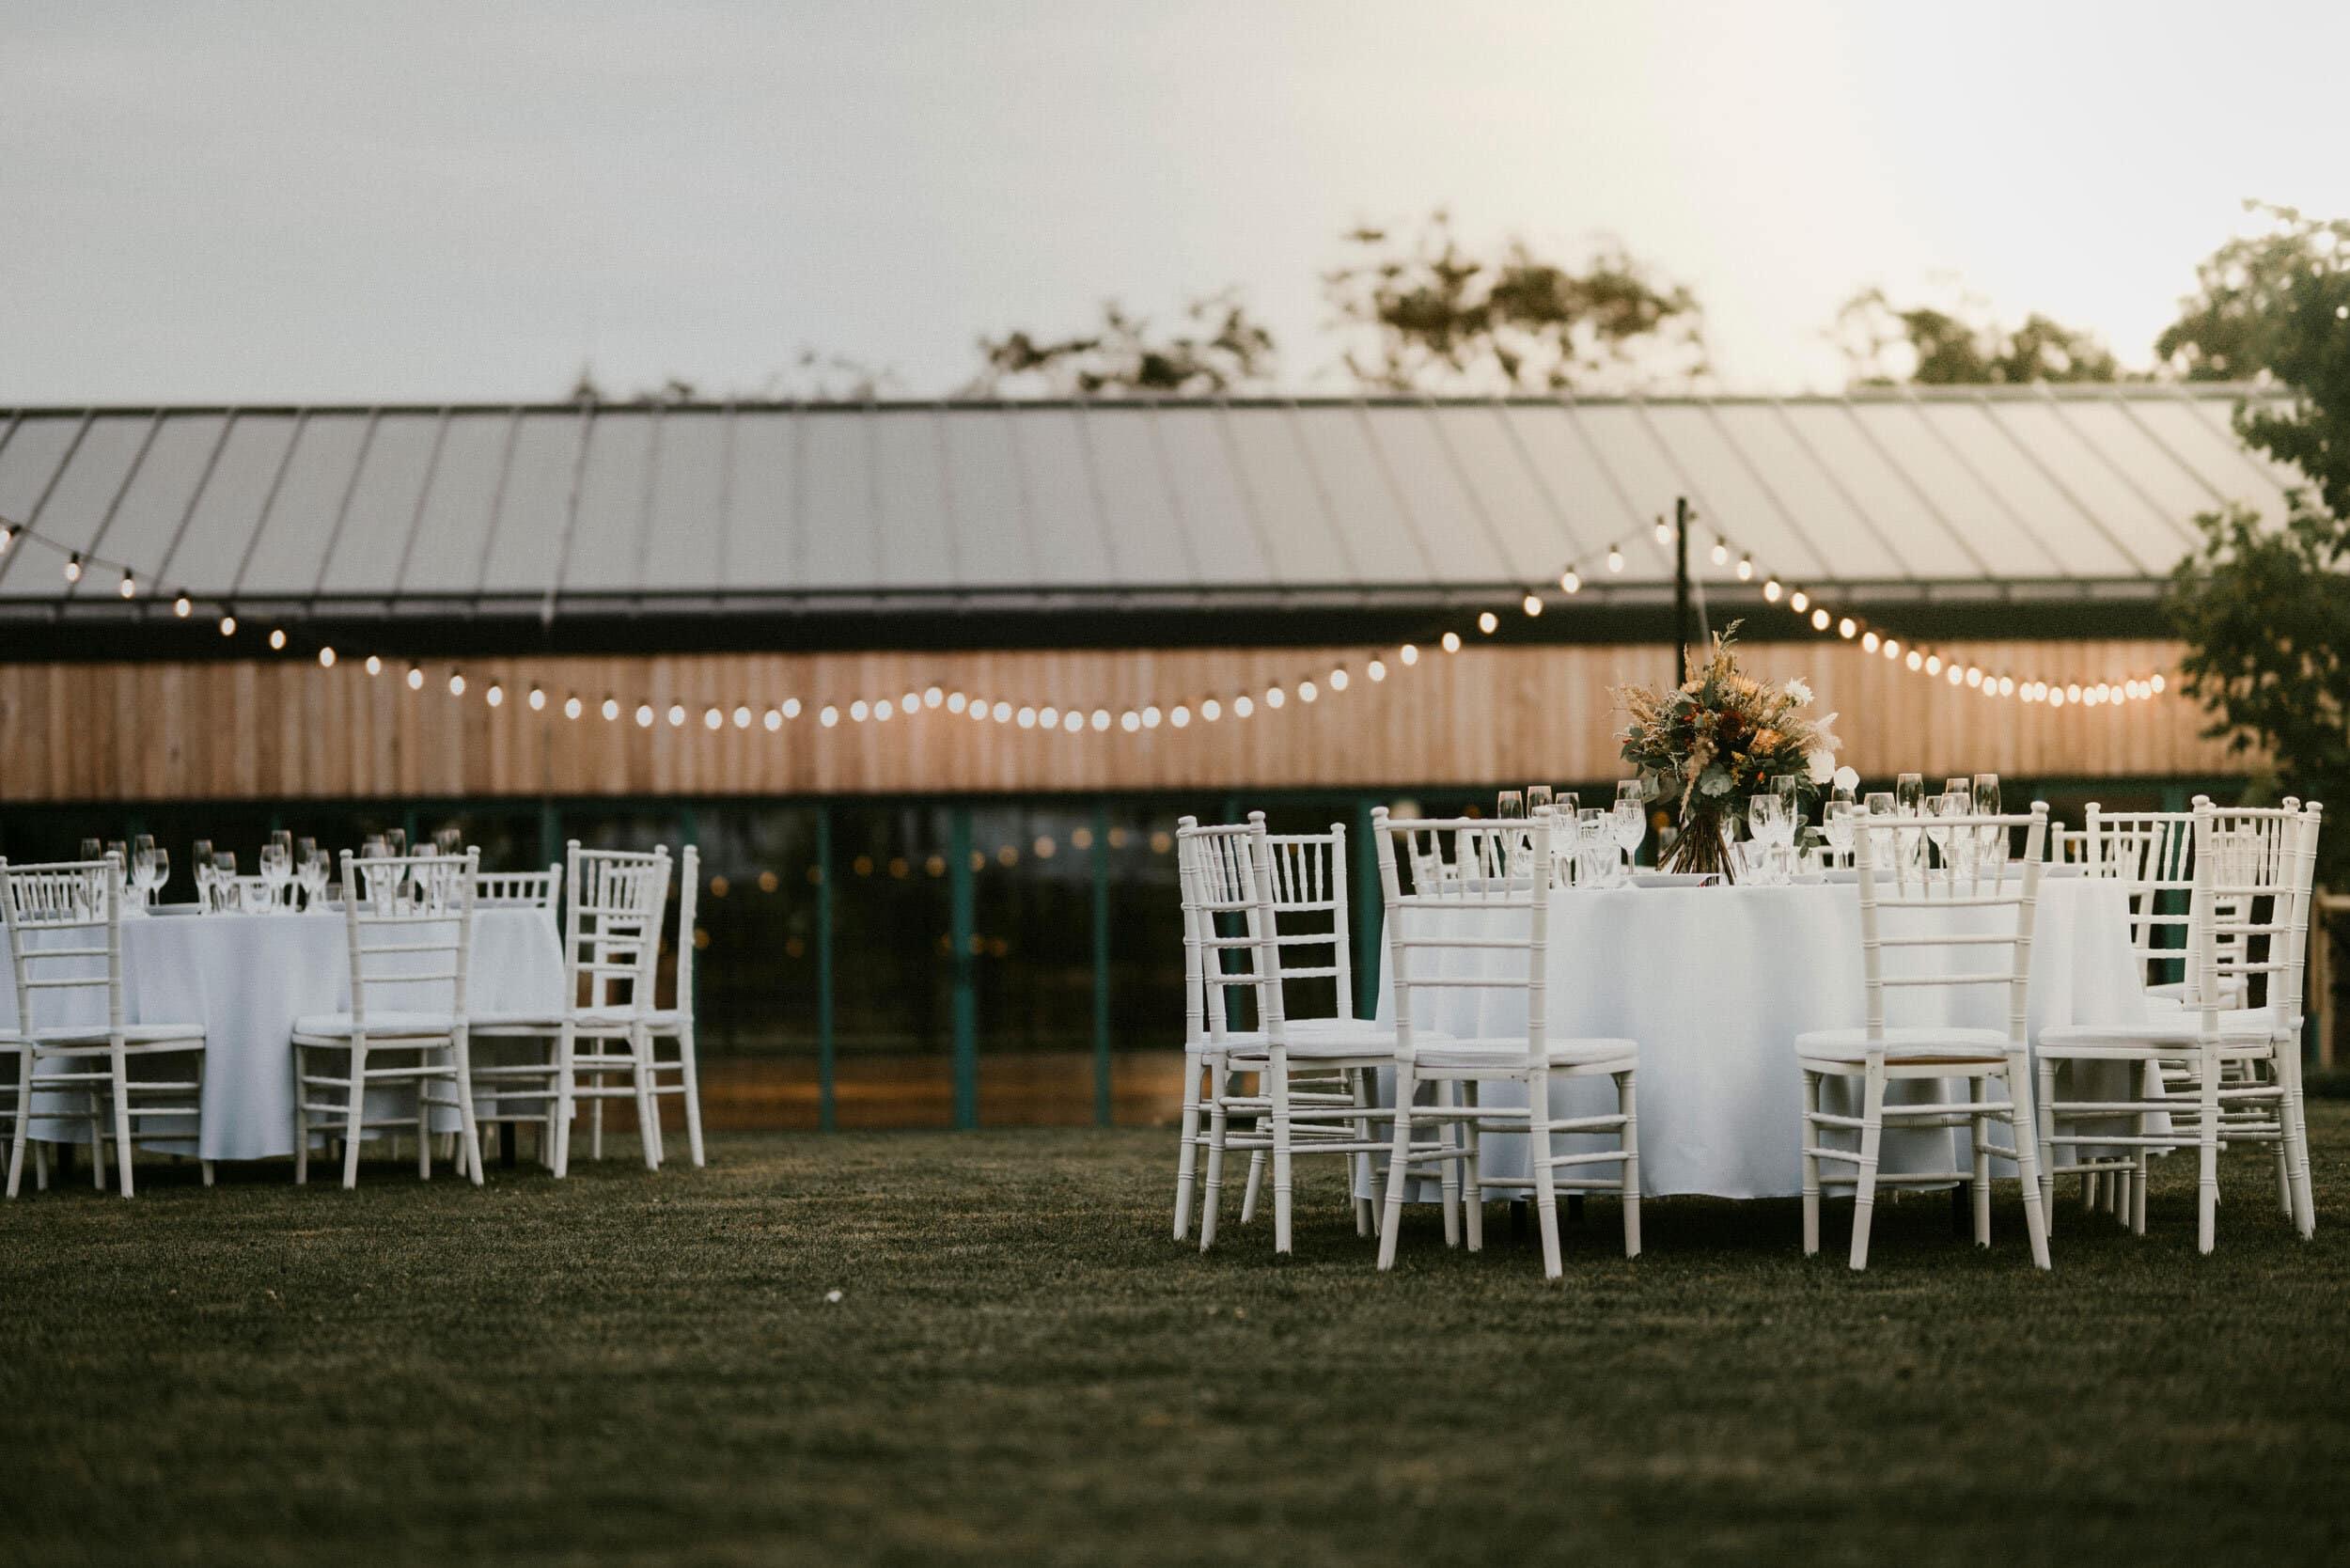 svadba na gaštanke, hacienda, svadba, miesto, svadobny, den